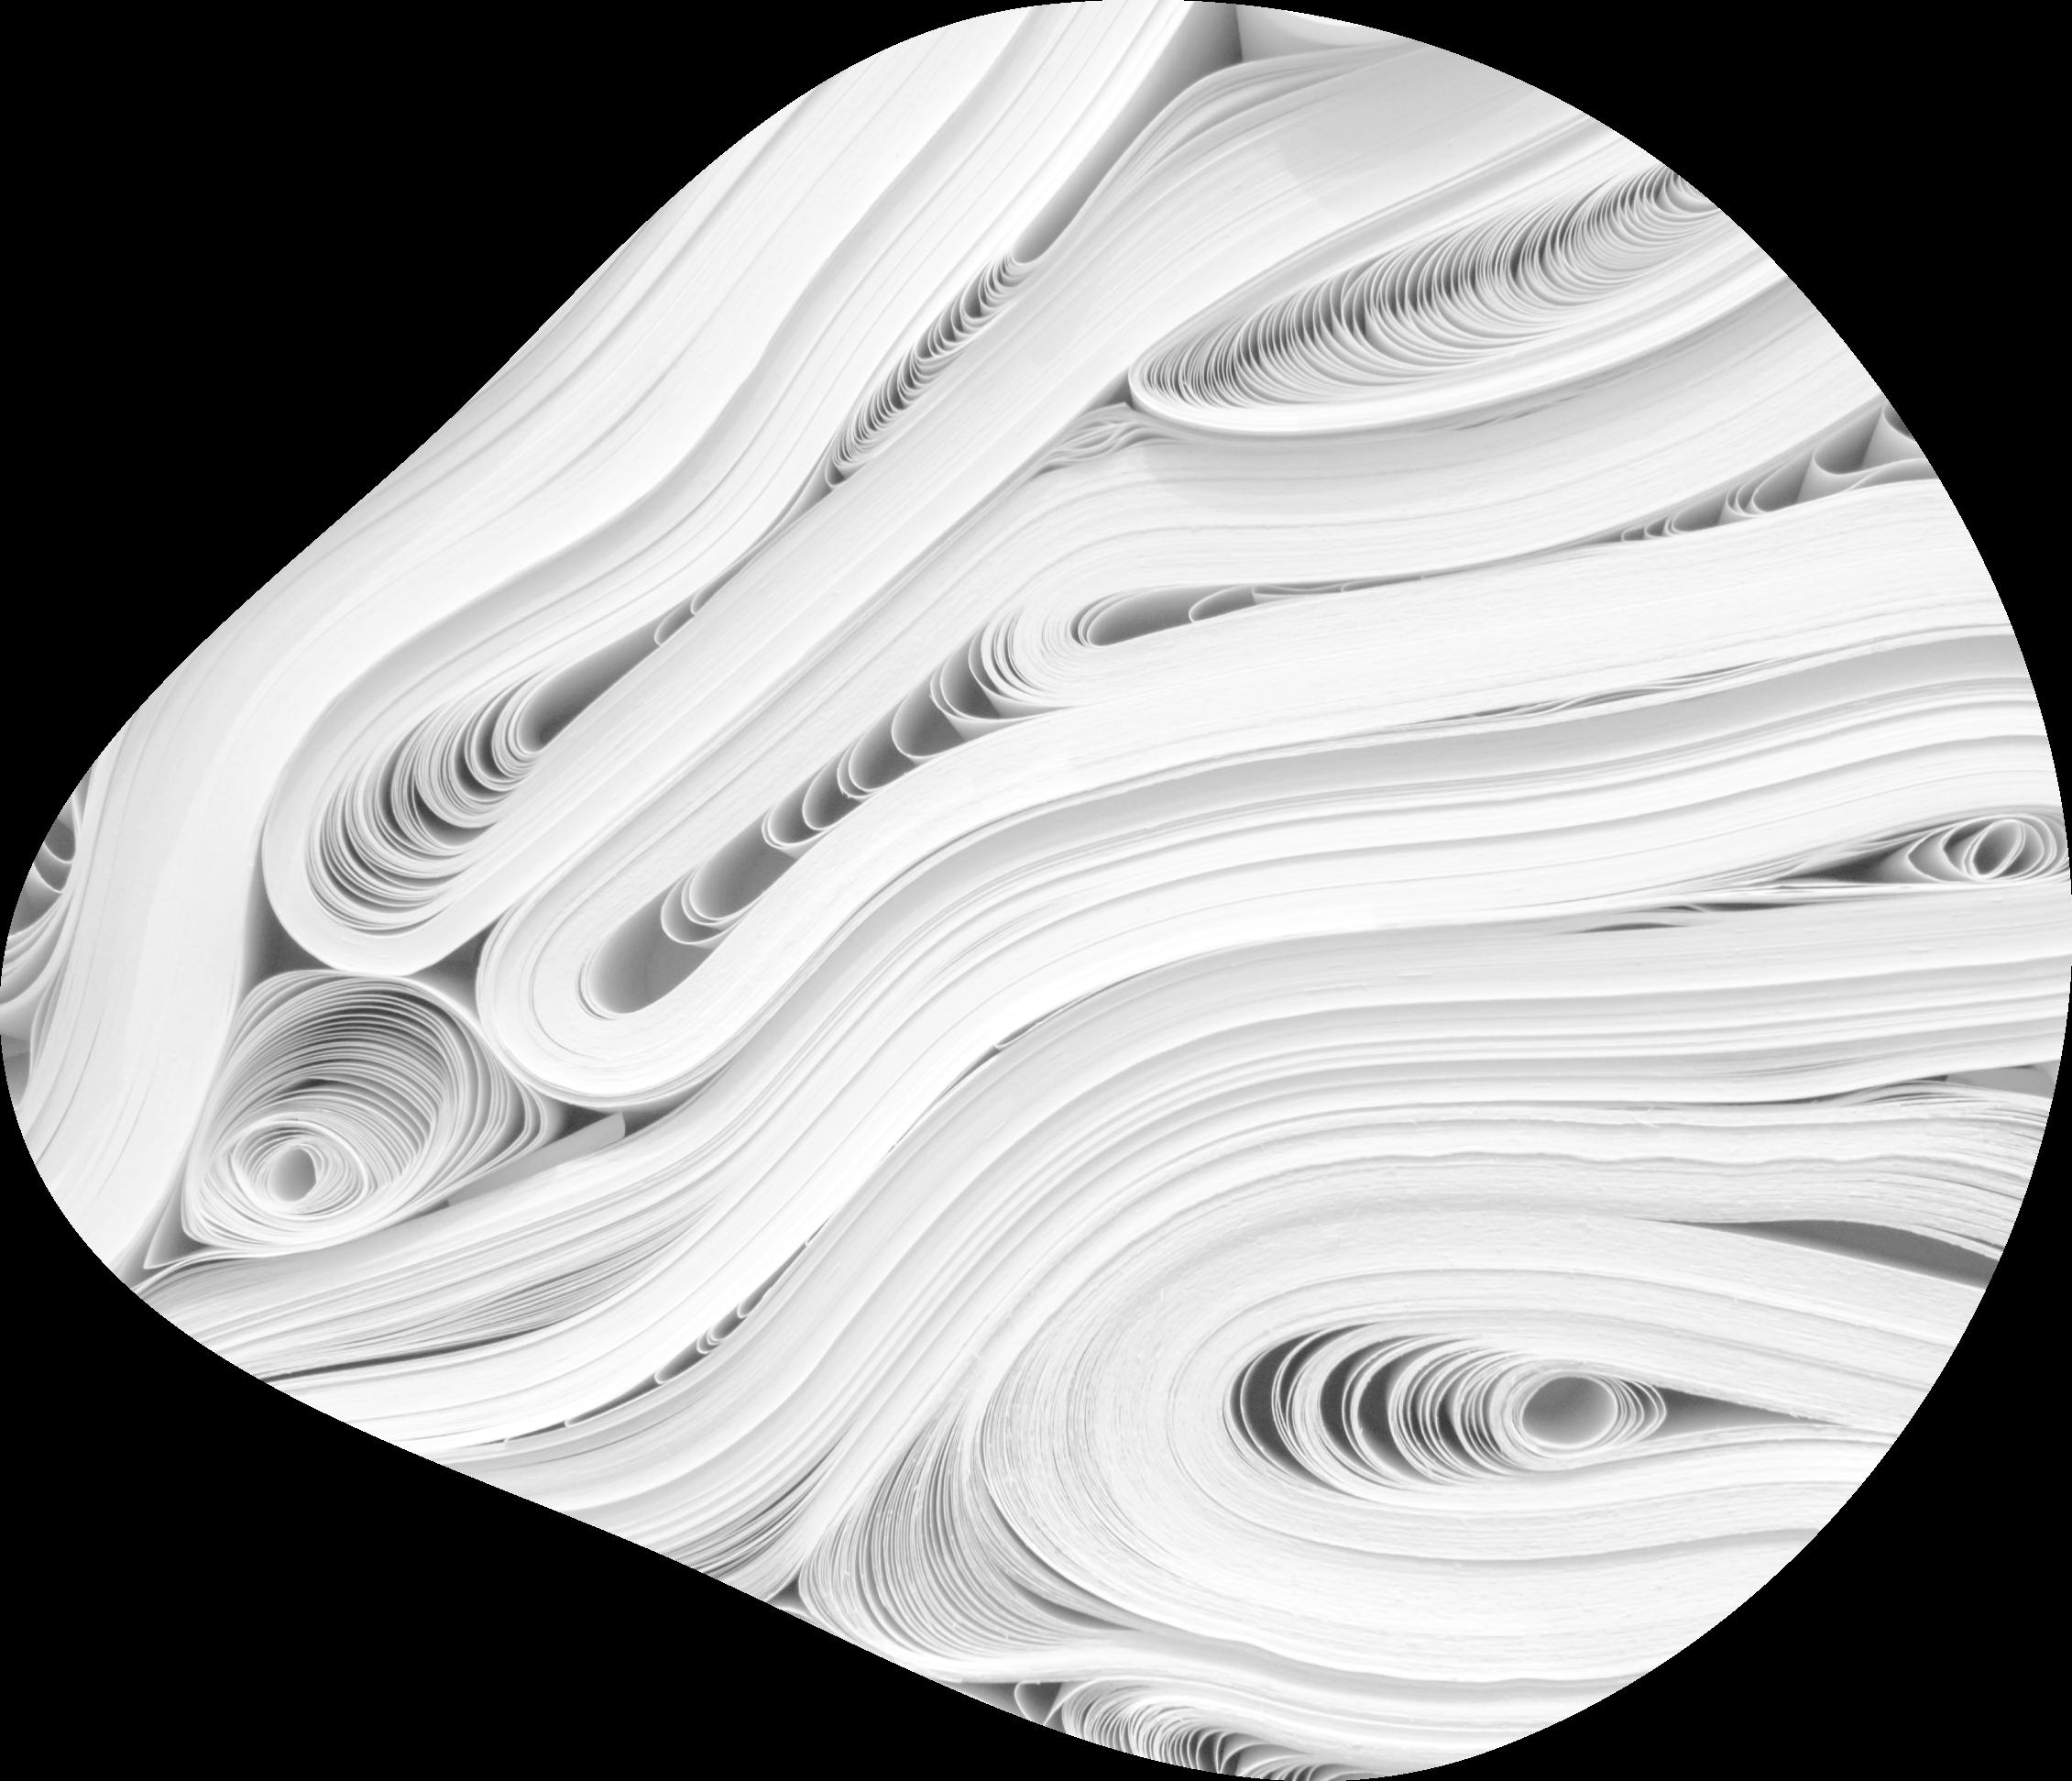 Wizata - Industries - Pulp & Paper - Blob